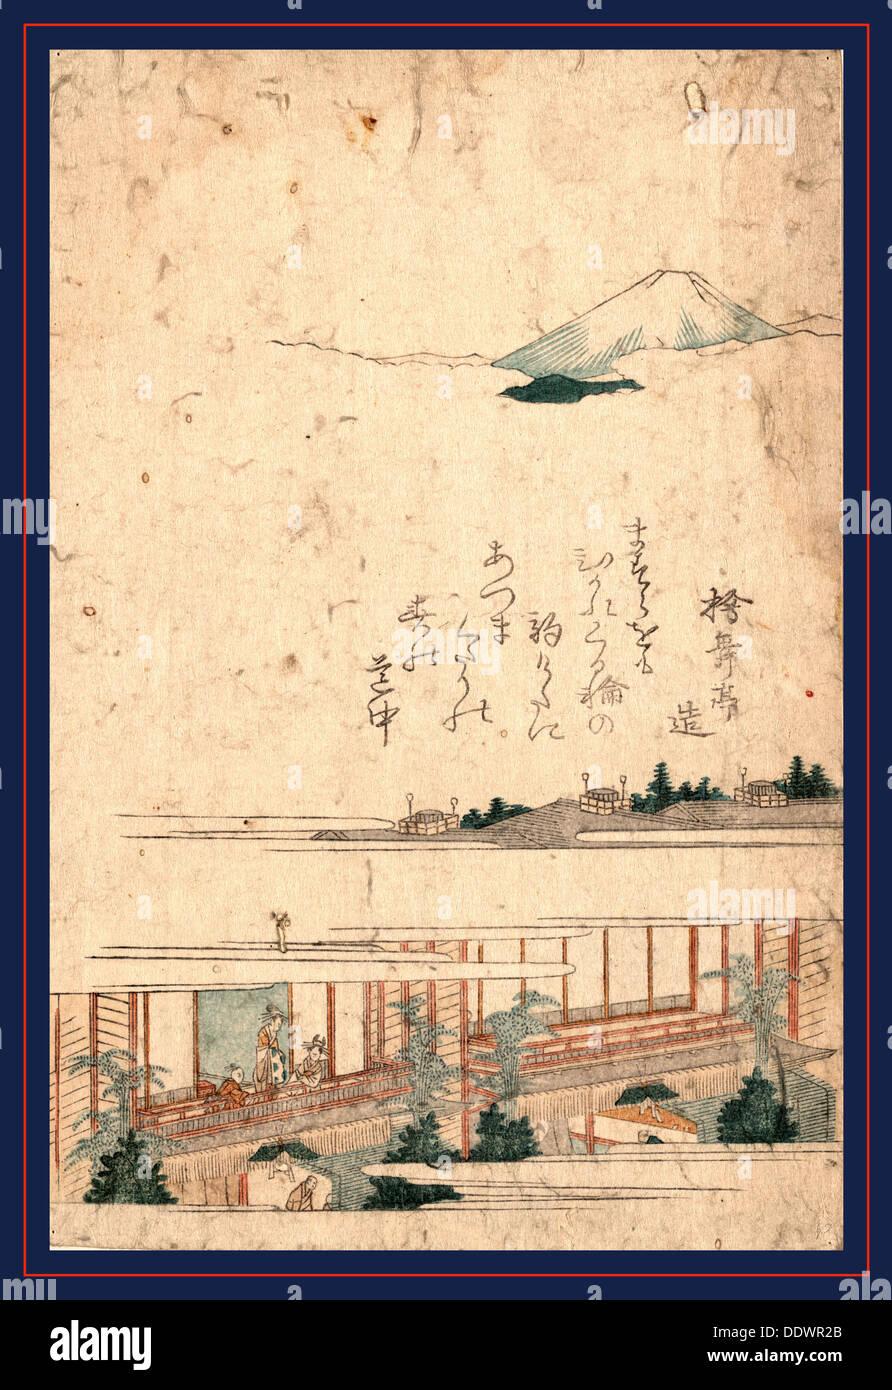 Yoshiwara, [between 1804 and 1818] 1 print : woodcut, color ; 20.6 x 13.7 cm. Print shows bird's-eye view of a yoshiwara with - Stock Image